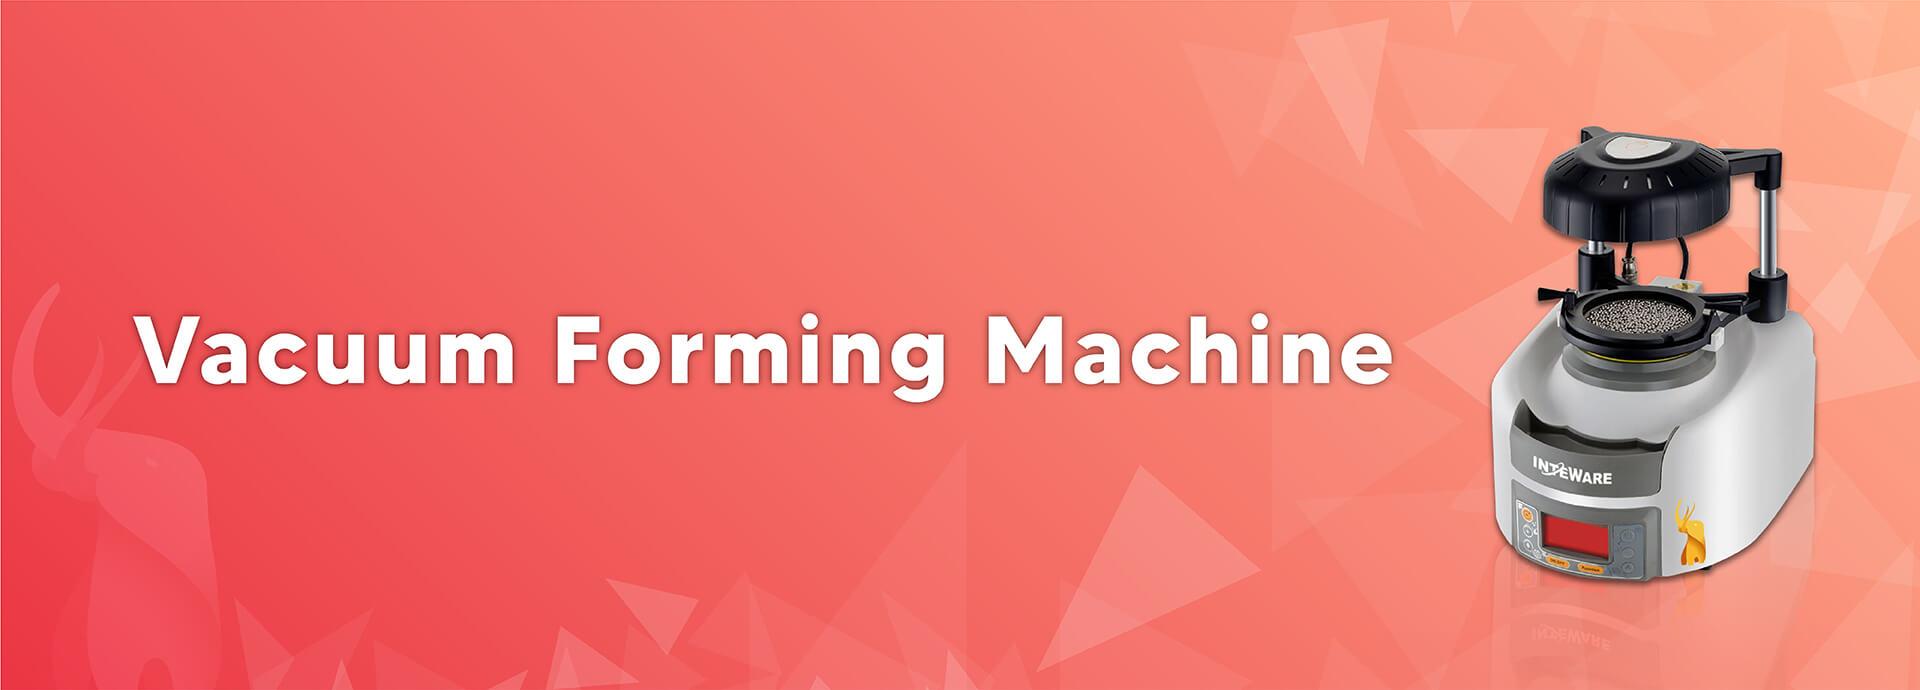 T-Eng_VacuumFormingMachine0330